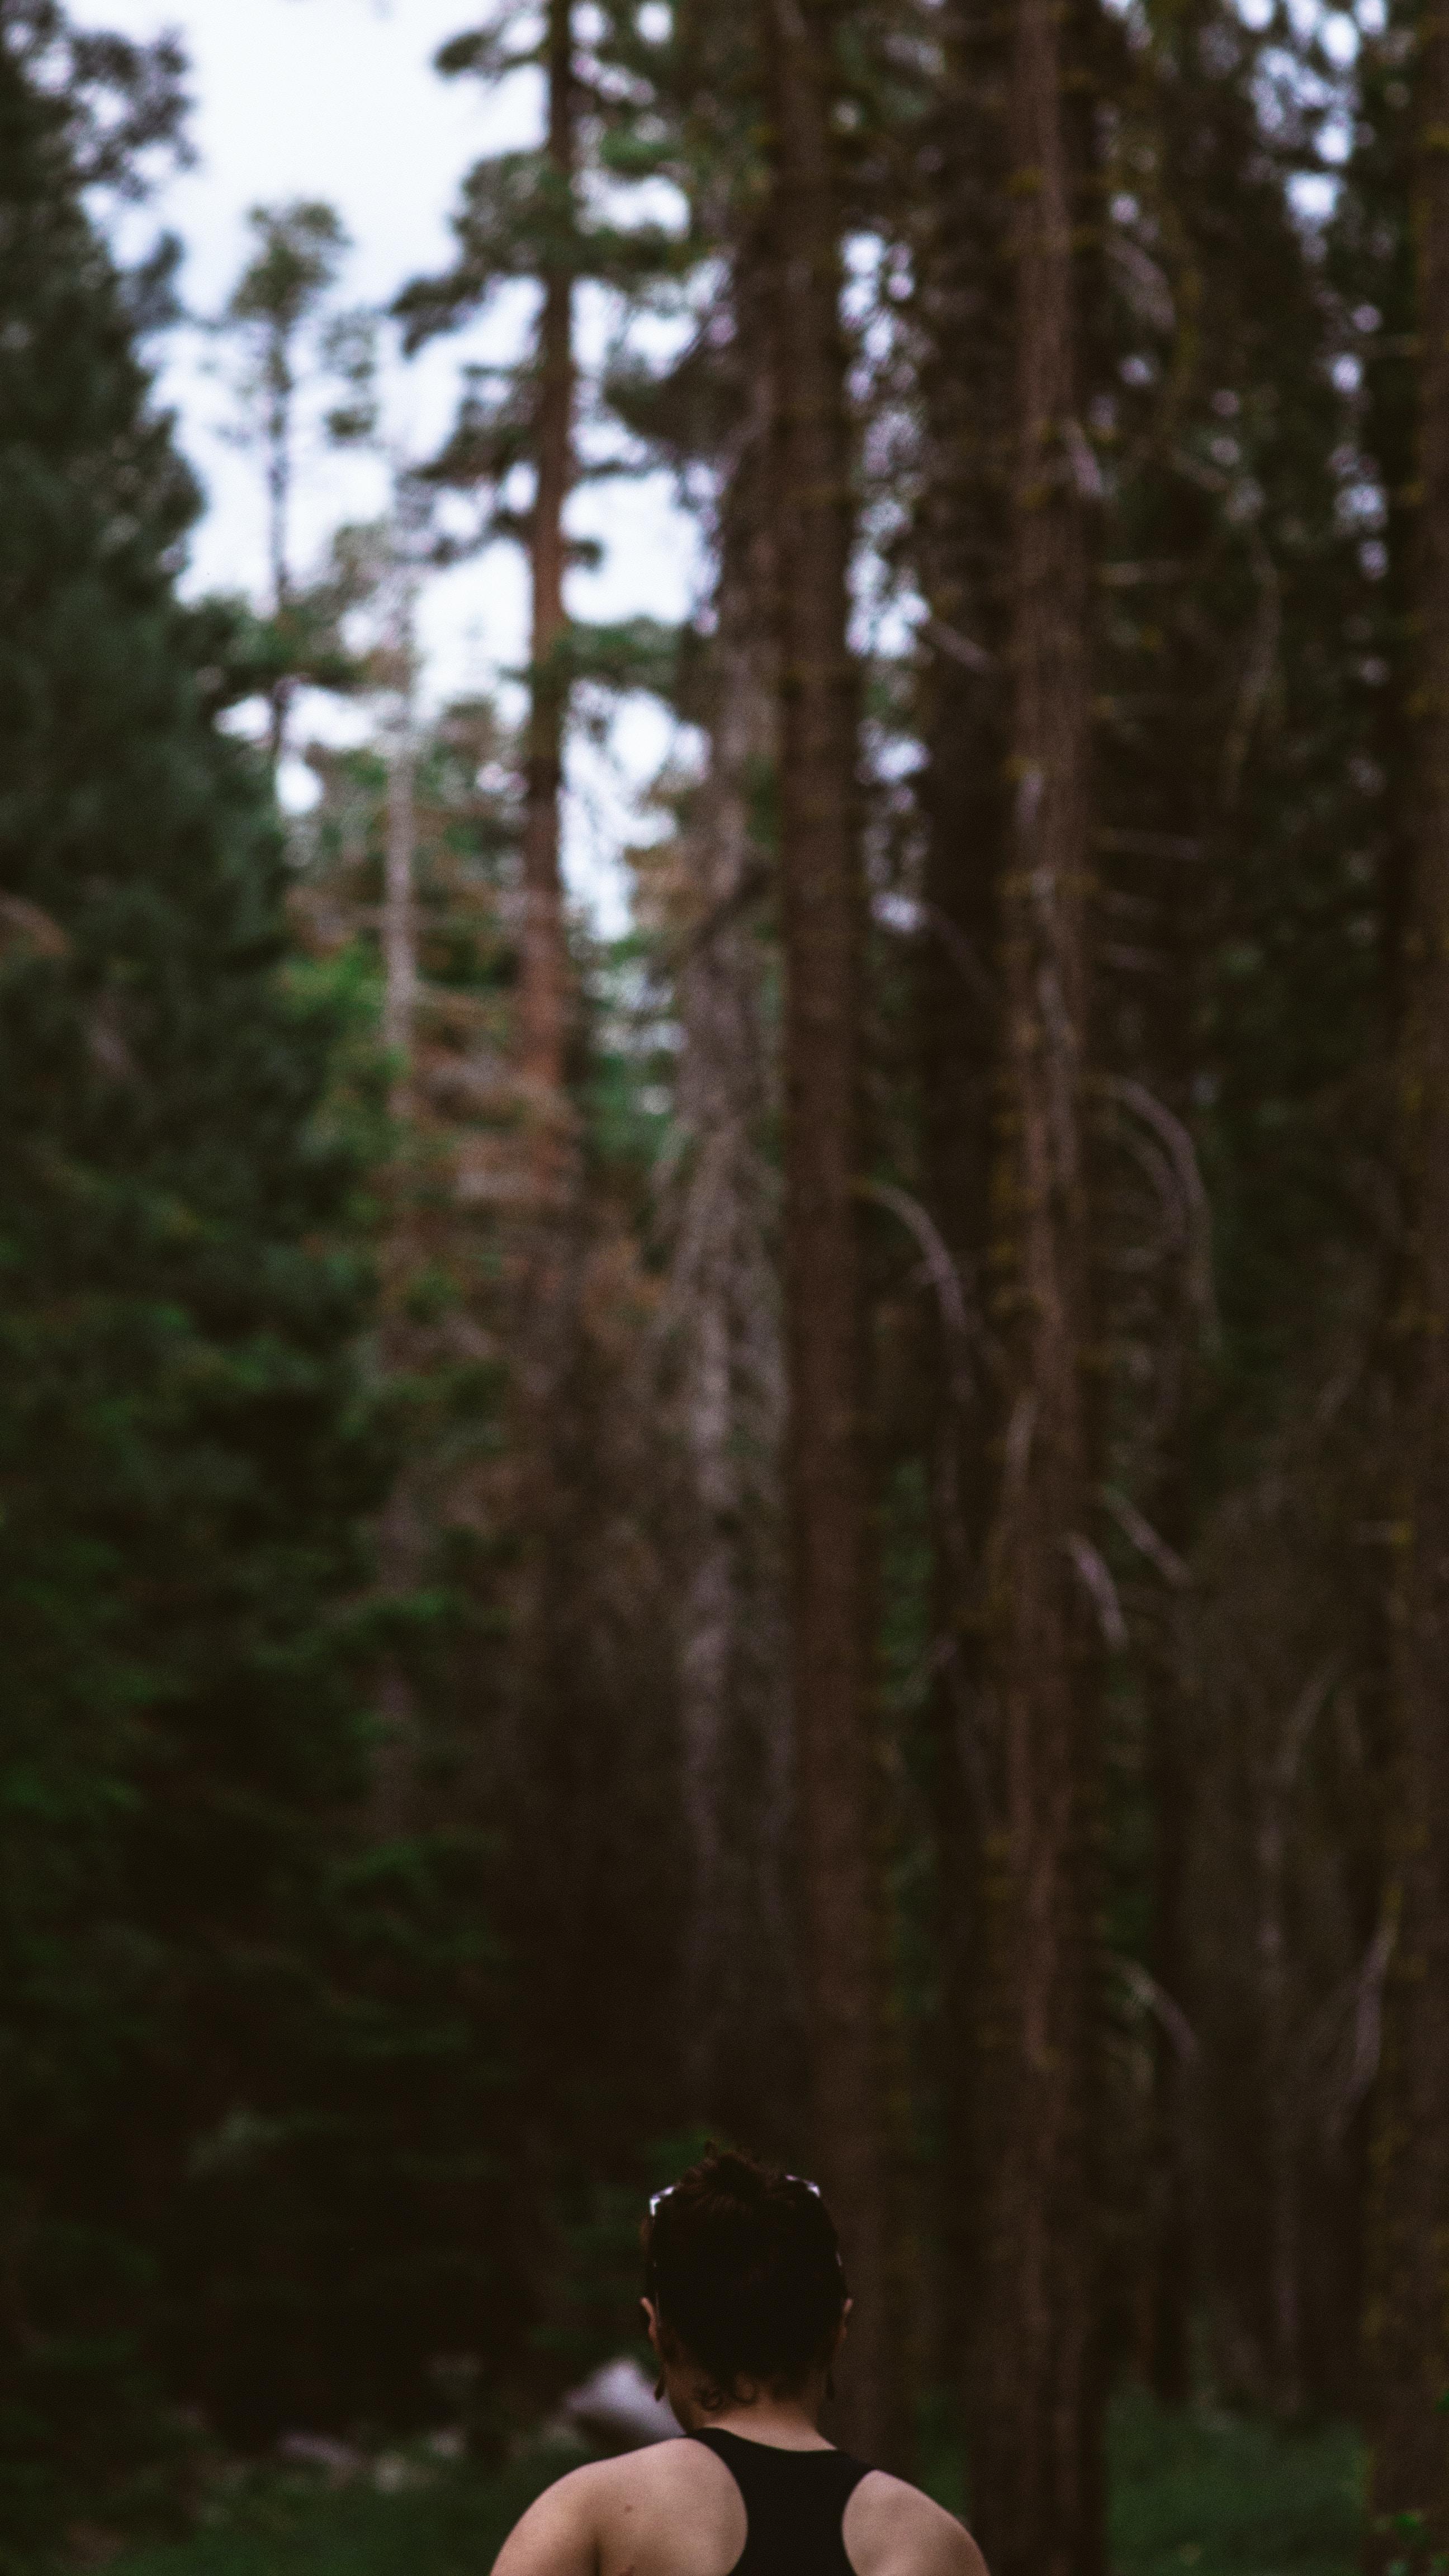 Free Unsplash photo from Matthew Dix